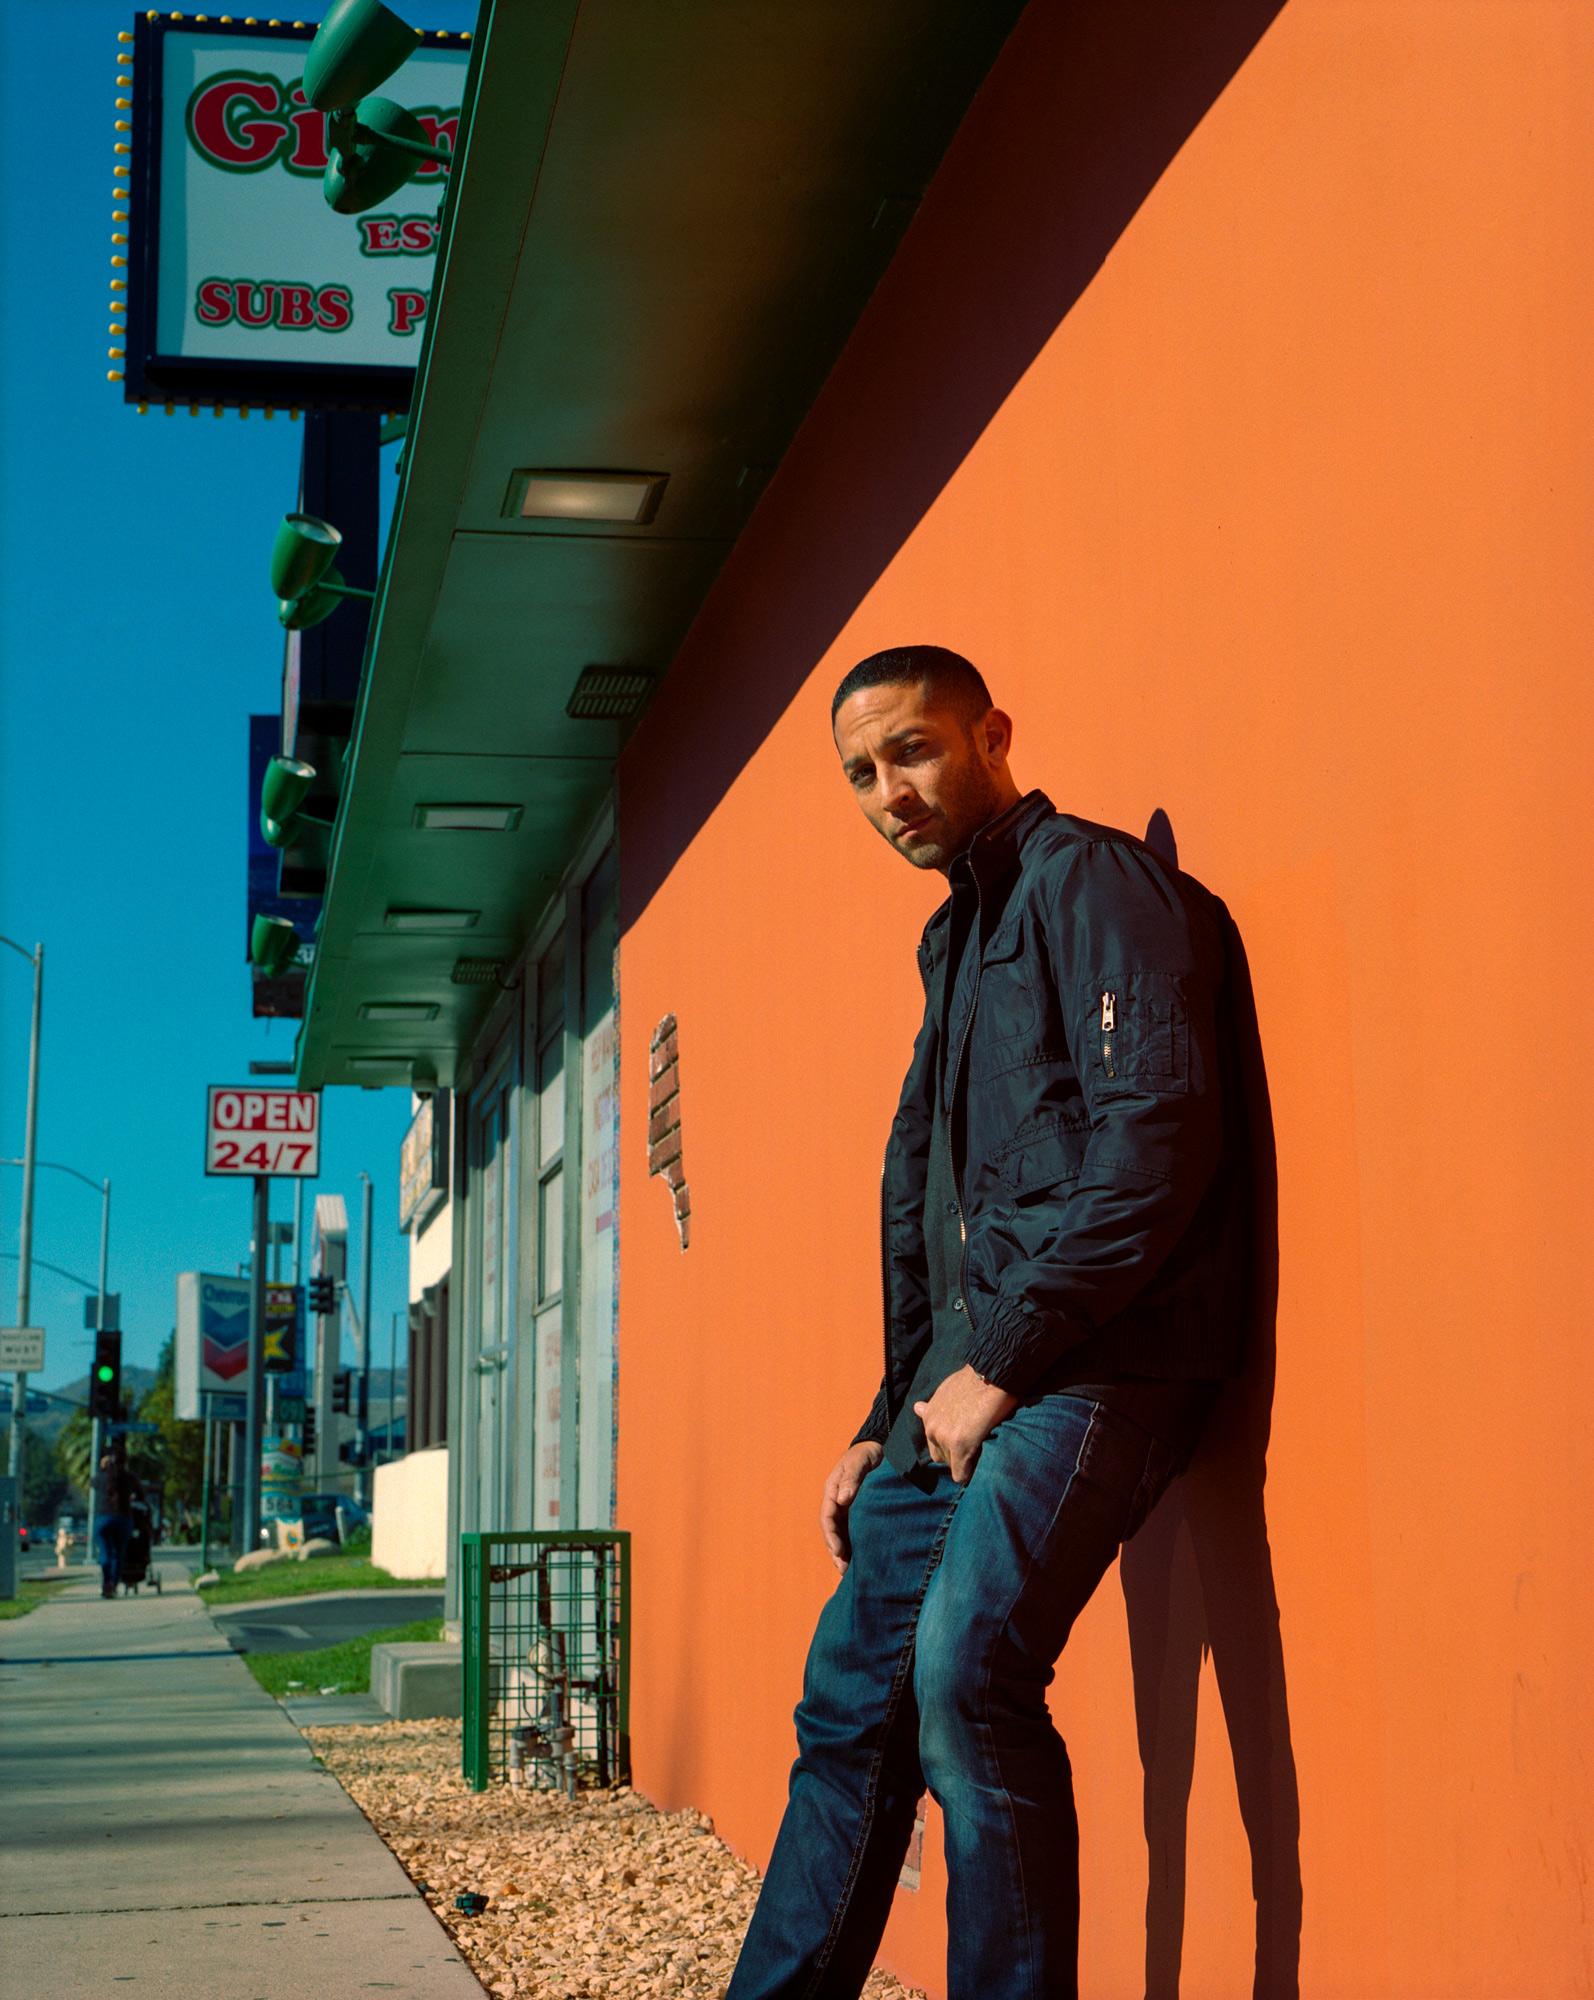 Brent Guiterriez, Actor, Los Angeles, Photography By Ioannis Koussertari.